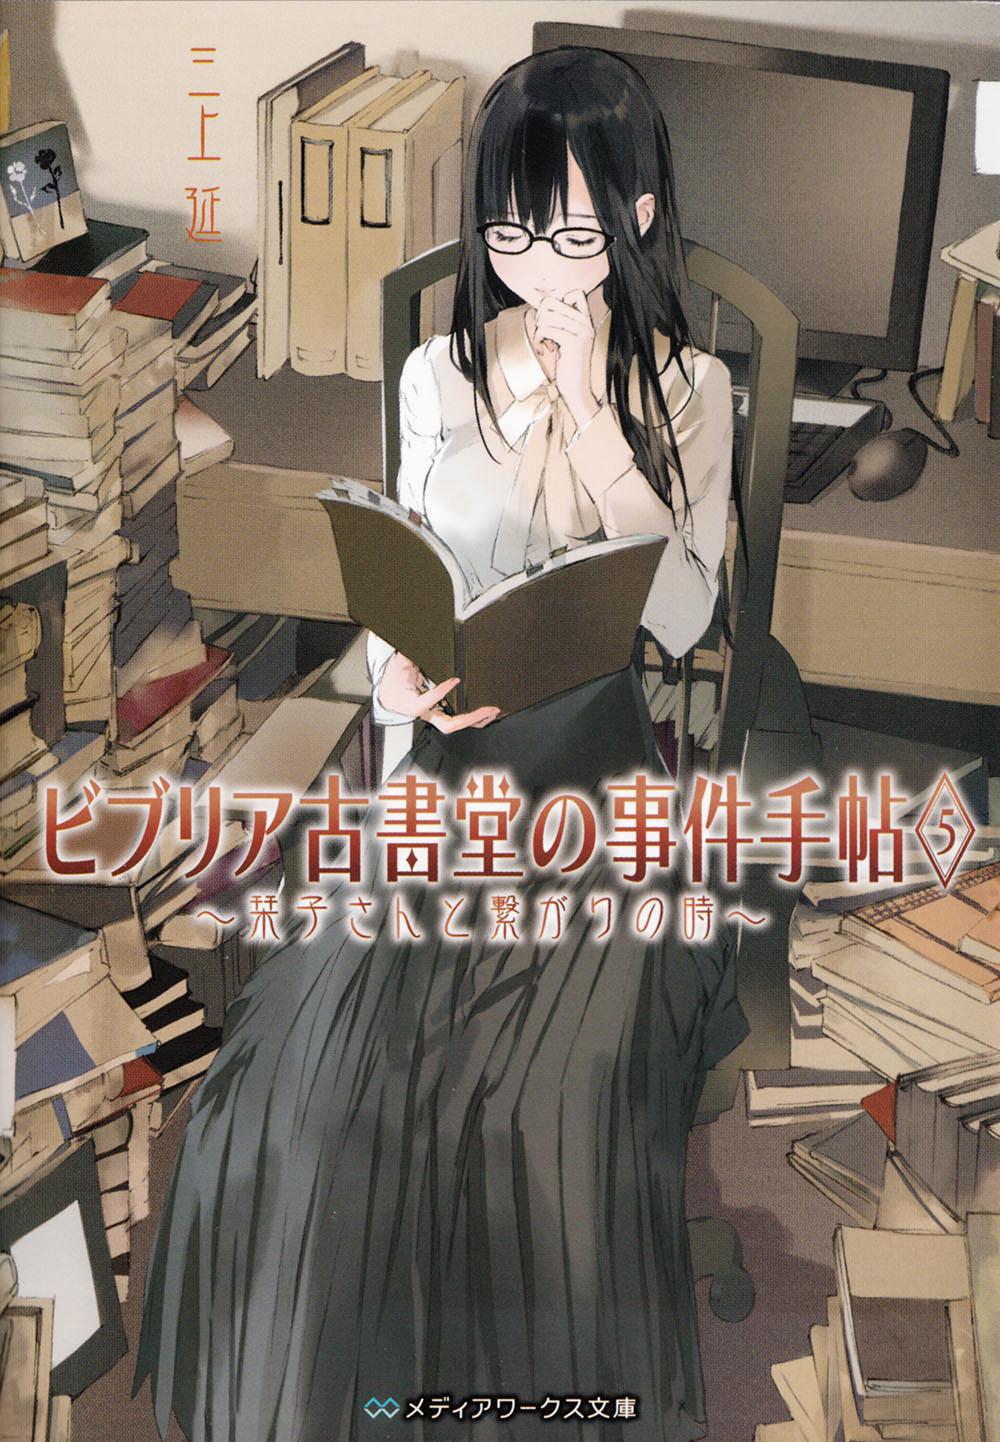 Top 10 Best Selling Anime, Manga and Light Novels from Amazon Haruhichan.com Biblia Koshodou no Jiken Techou volume 5